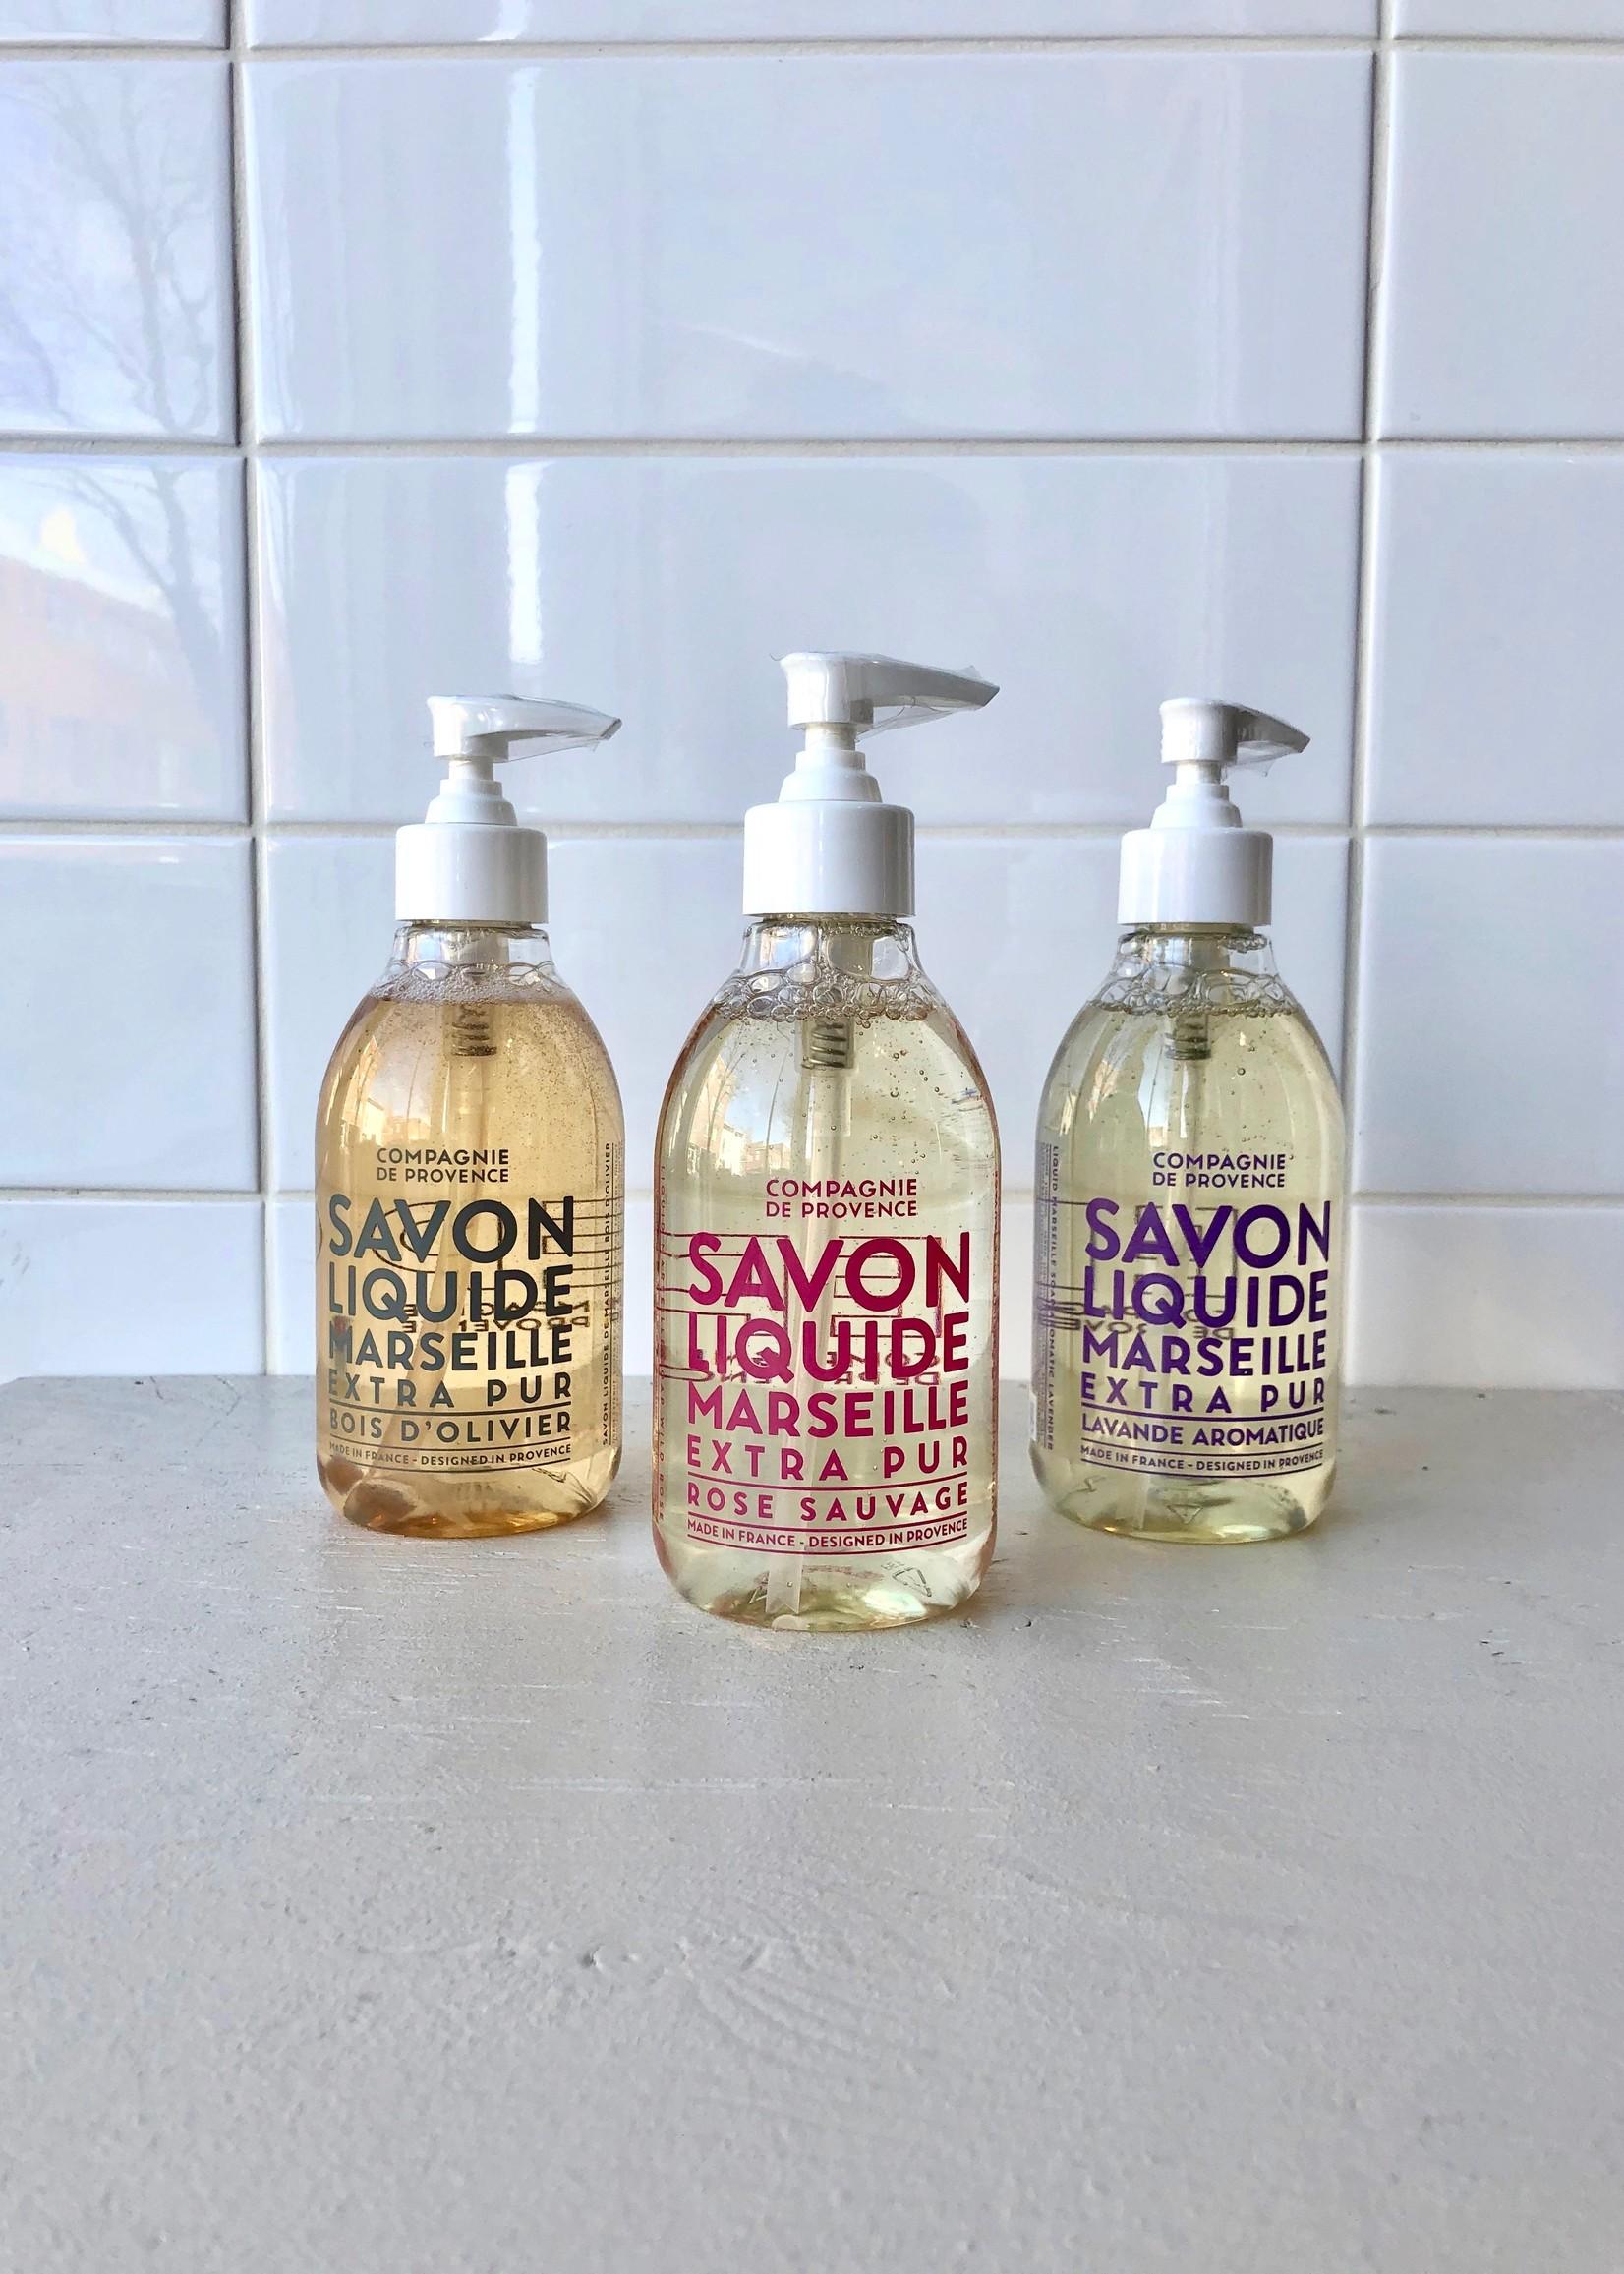 Compagnie de Provence Savon liquide Compagnie de Provence